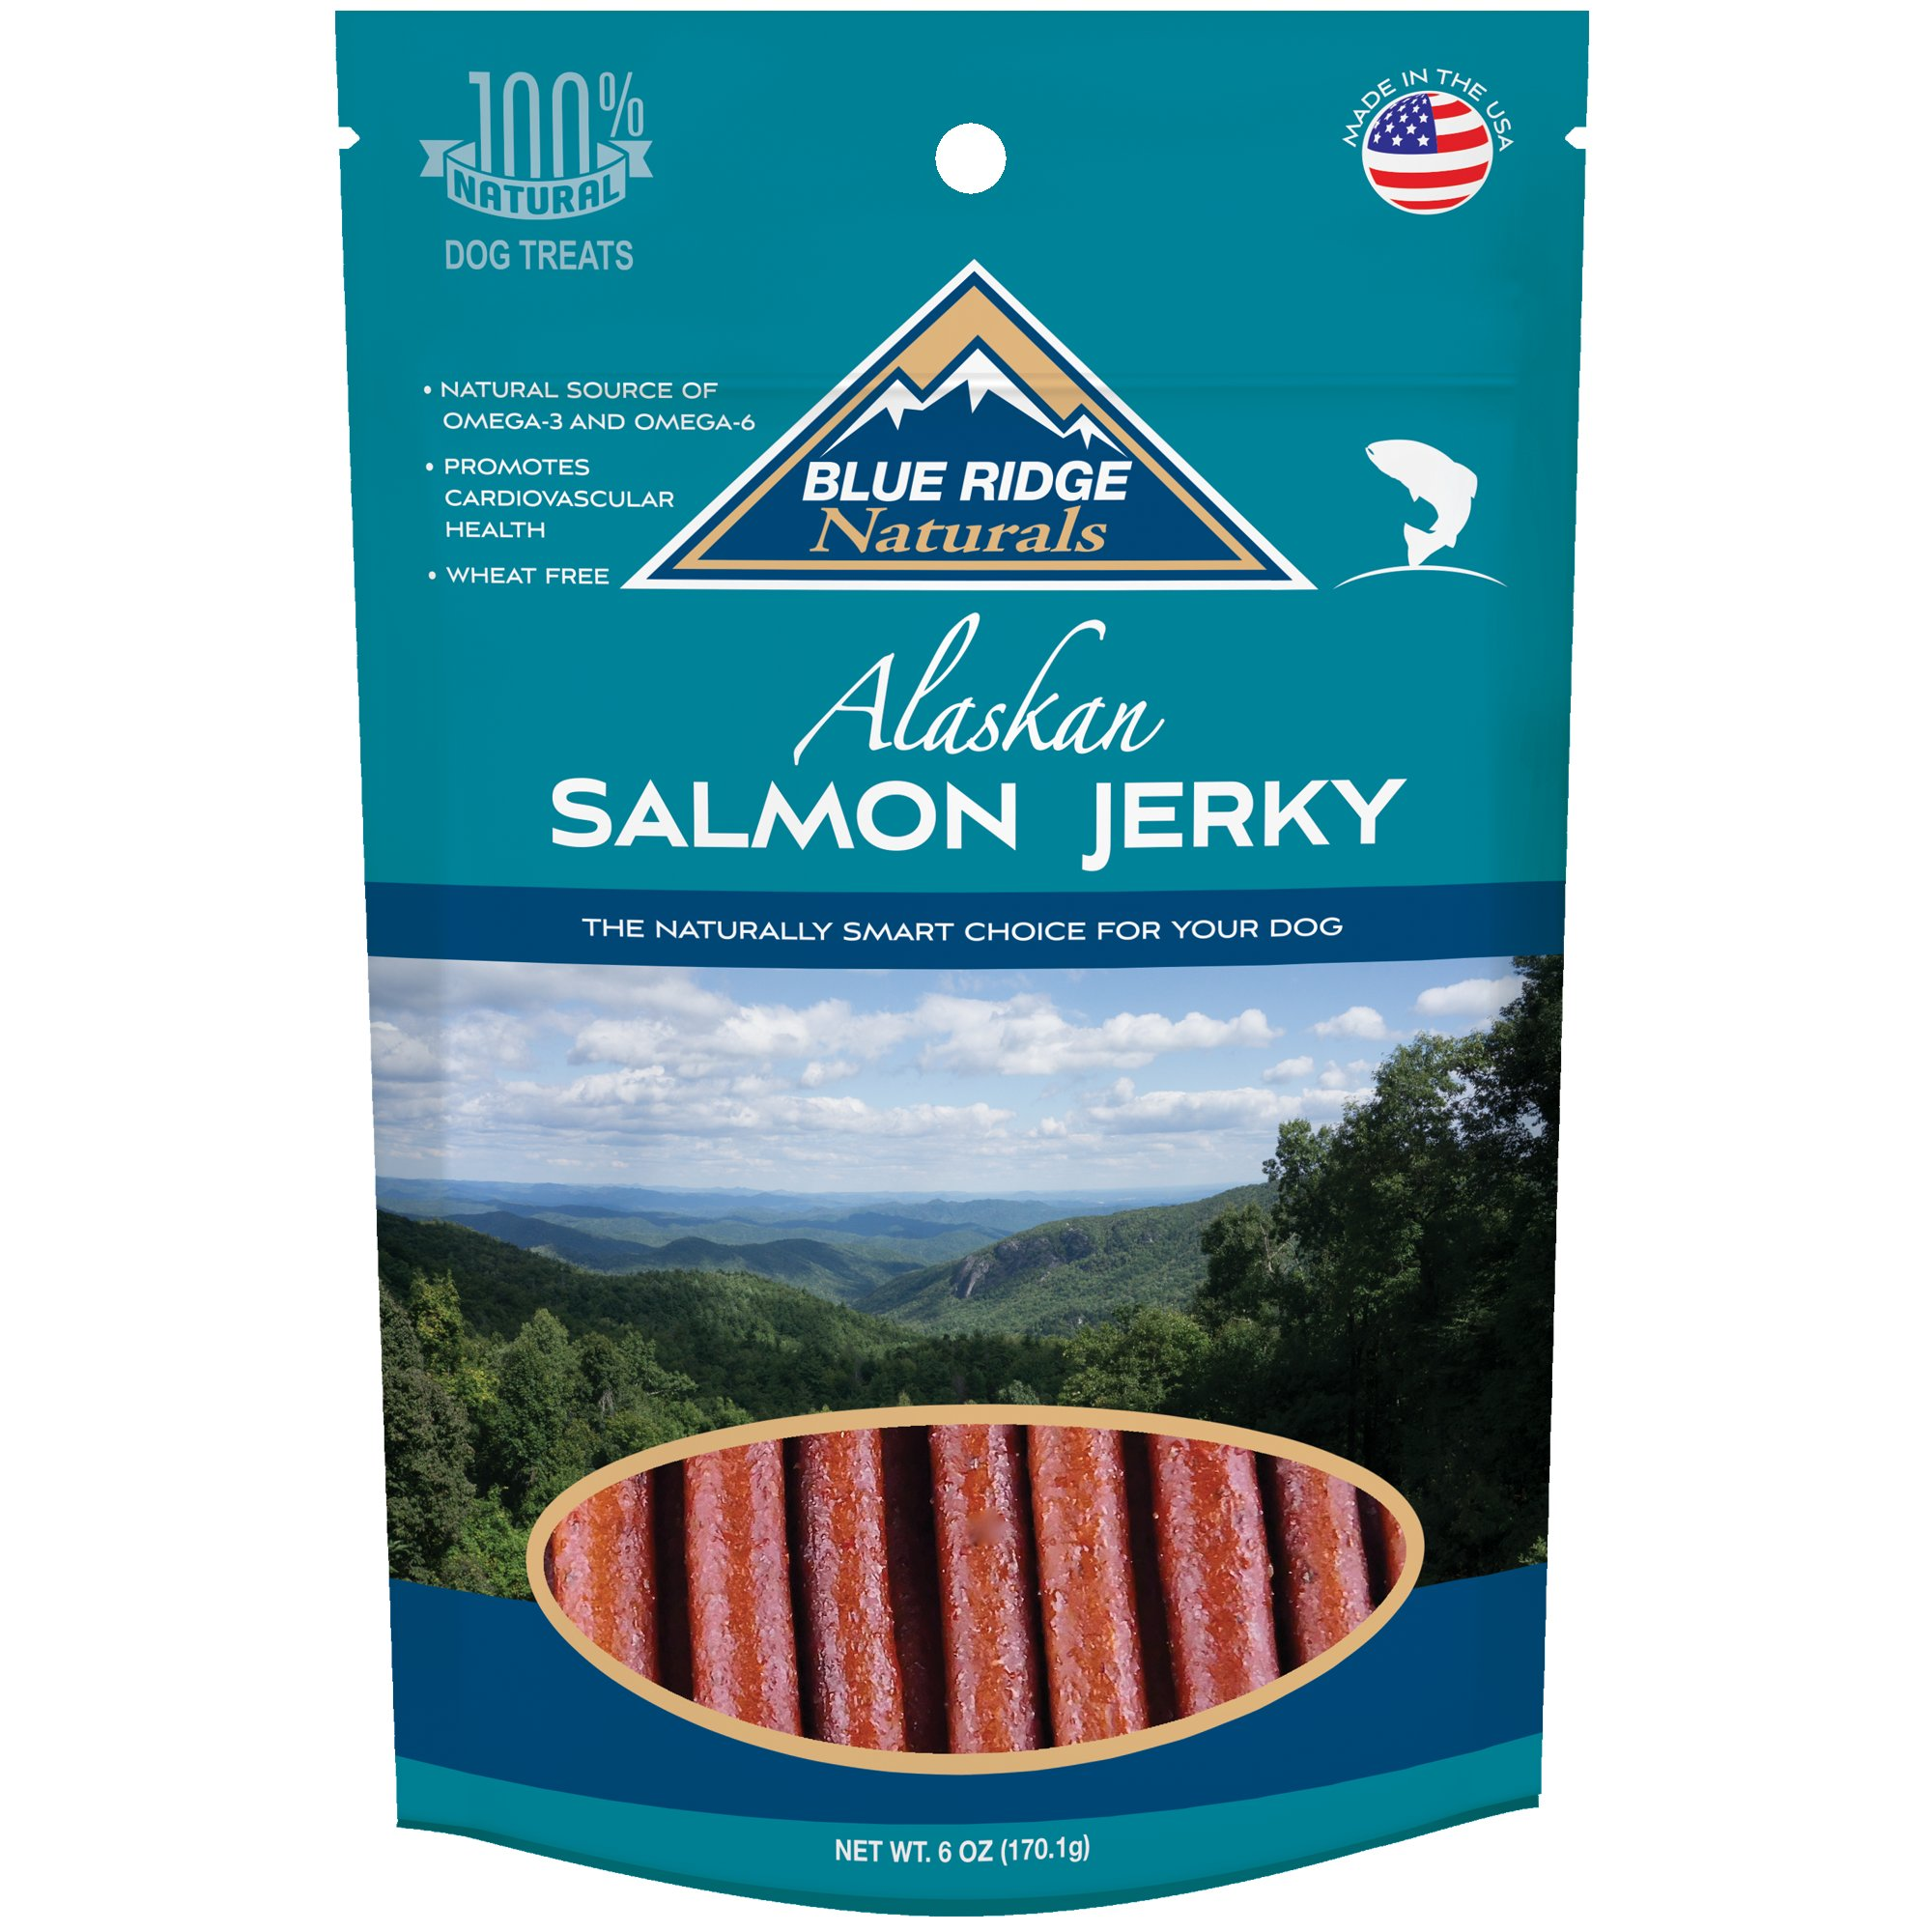 Blue Ridge Naturals Salmon Jerky Dog Treats